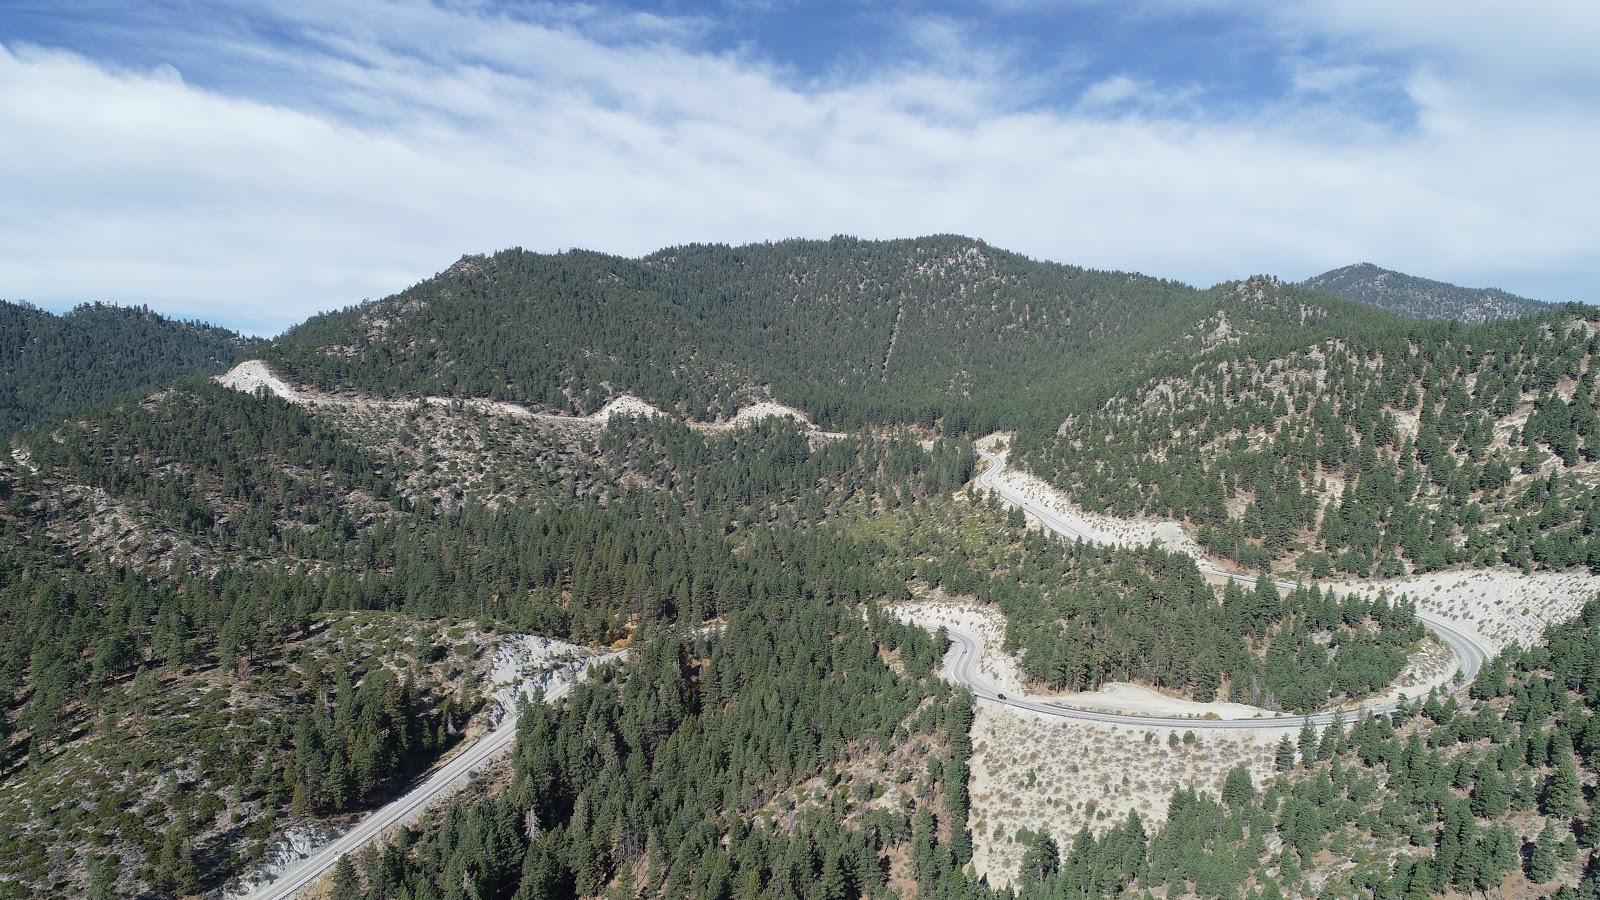 Drone photo of Kingsbury Grade near Daggett pass while climbing by bike.